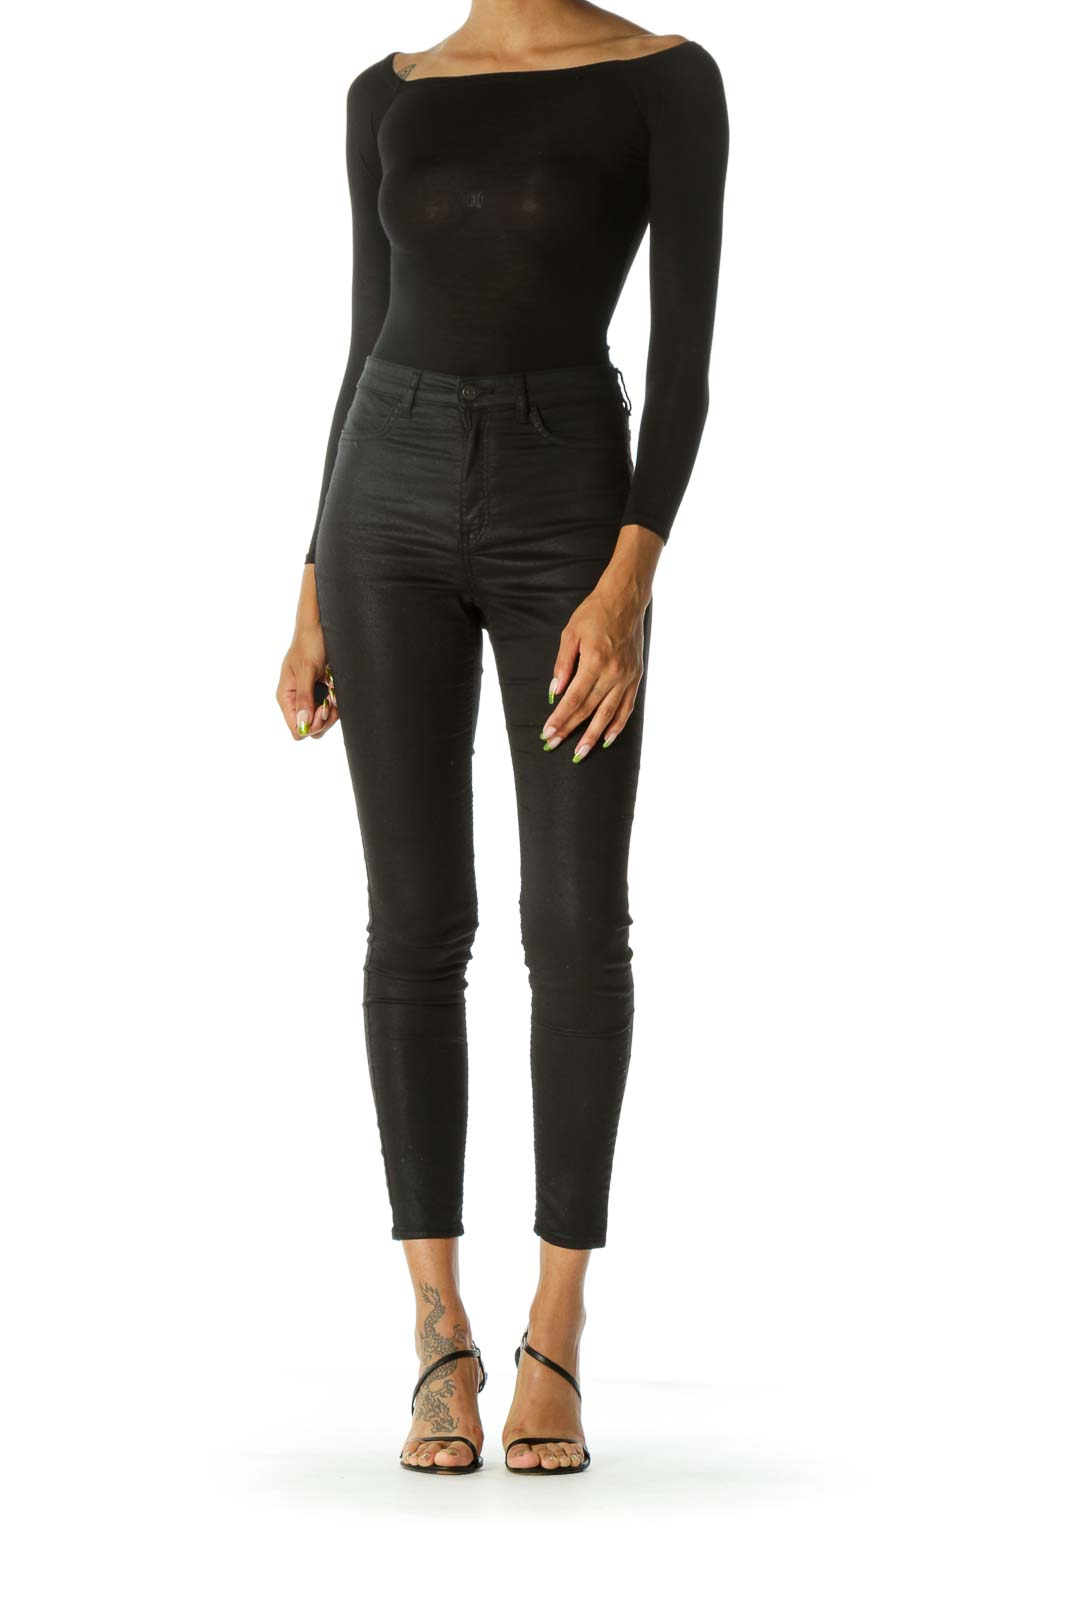 Black Cold Shoulder Jersey-Knit Stretch Bodysuit